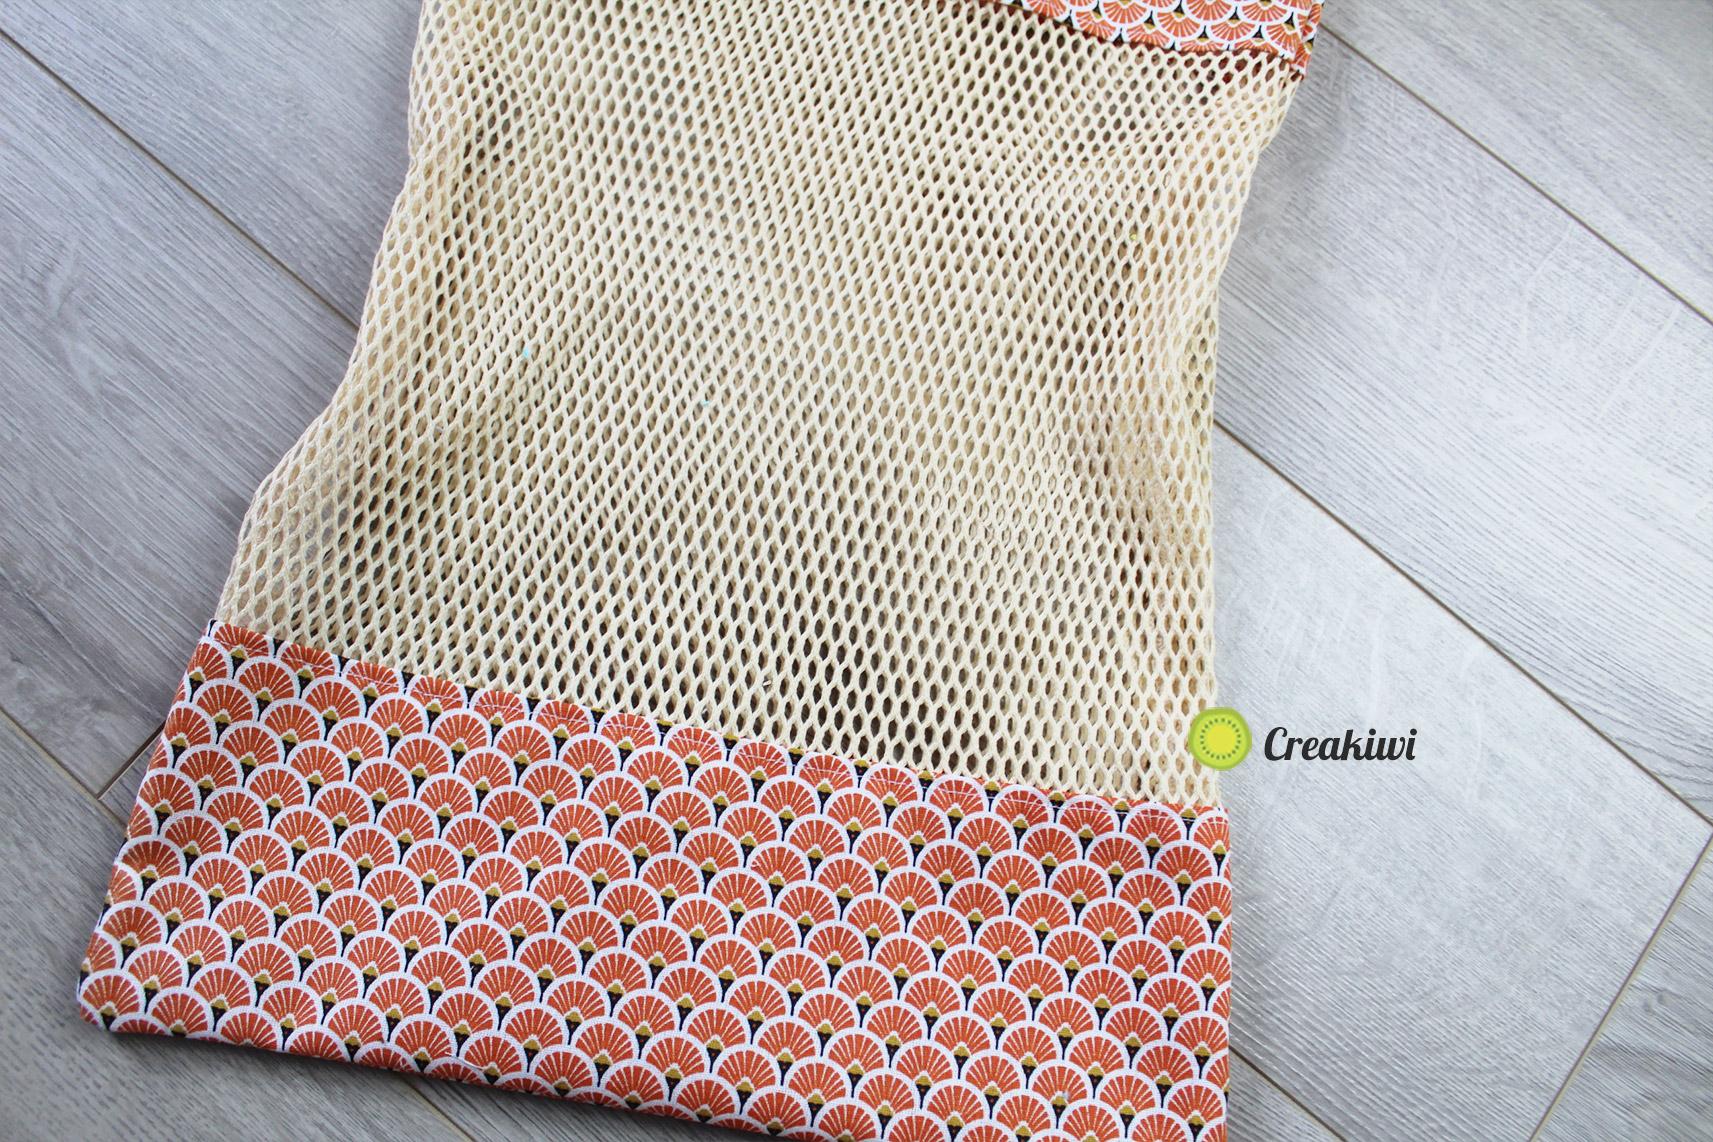 Sac à vrac orange avec filet en coton bio